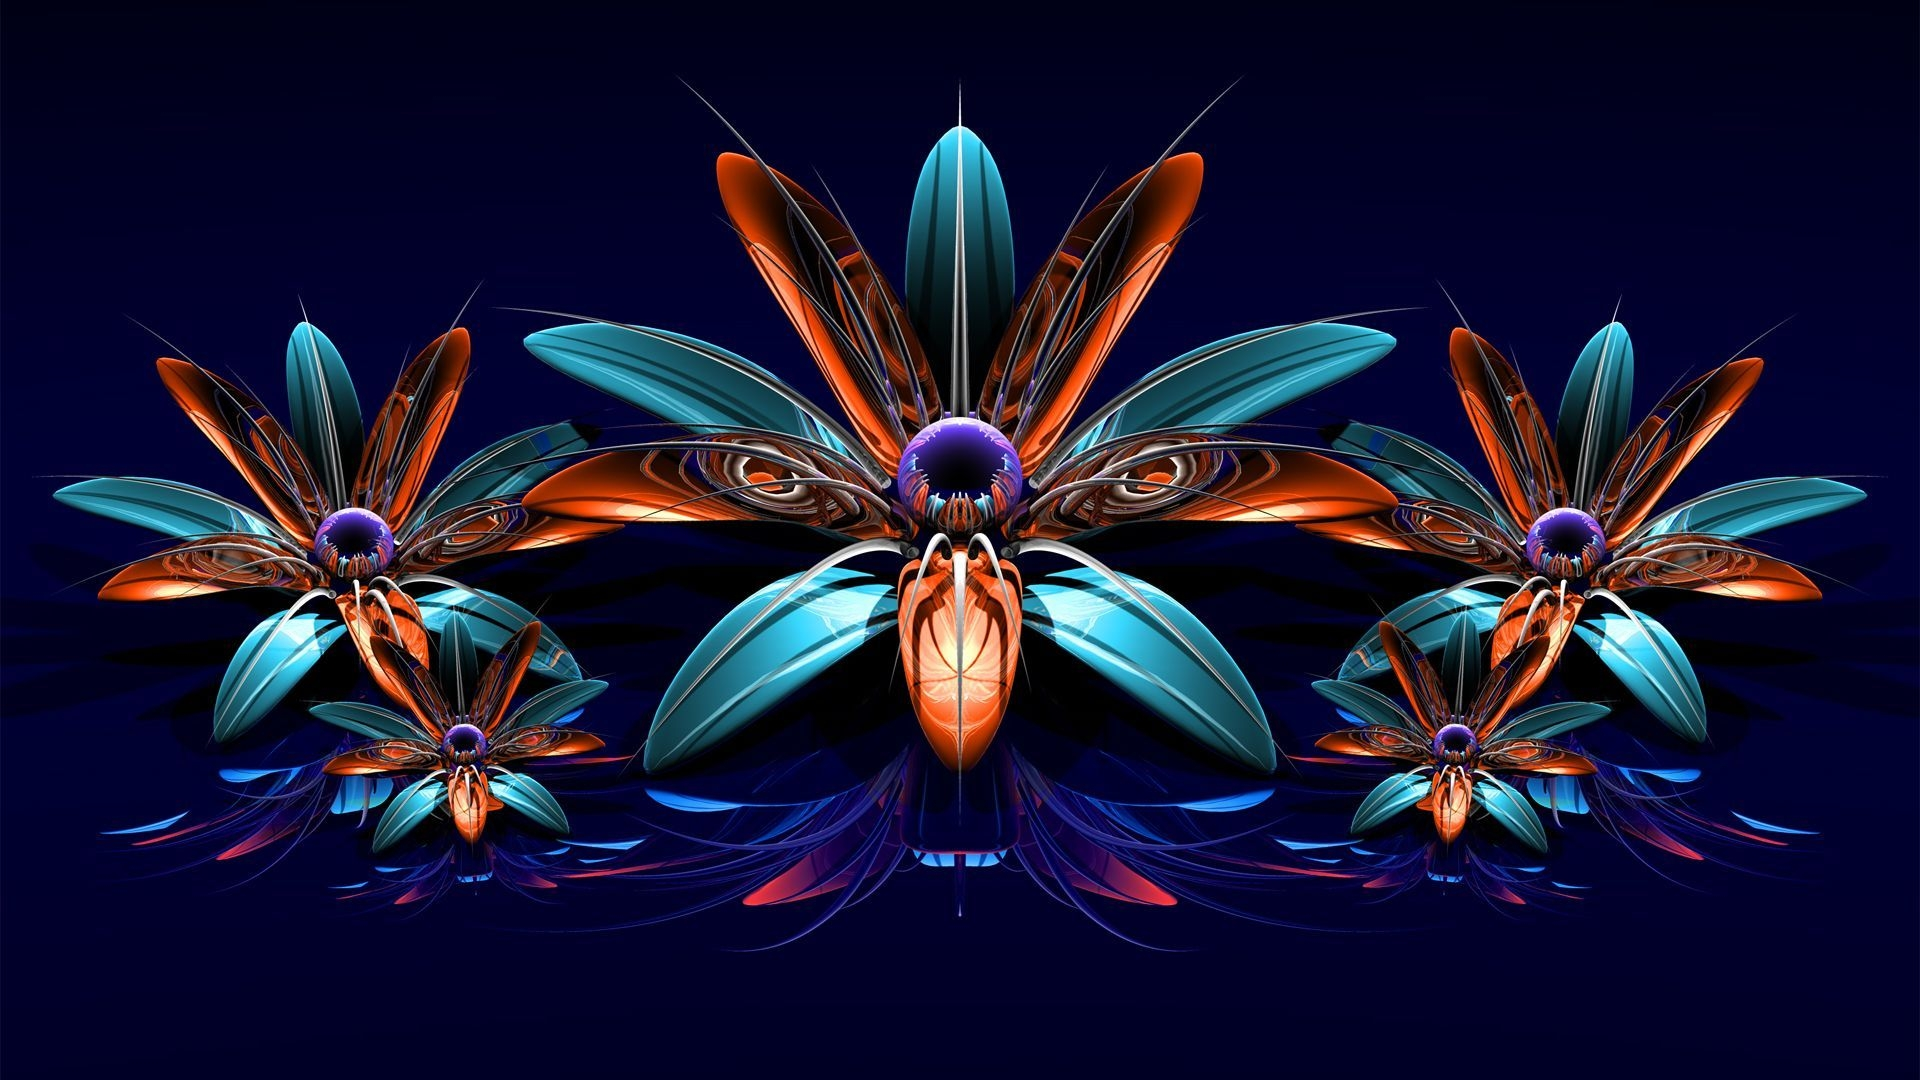 Fractal wallpapers pictures images for Sfondi desktop 3d